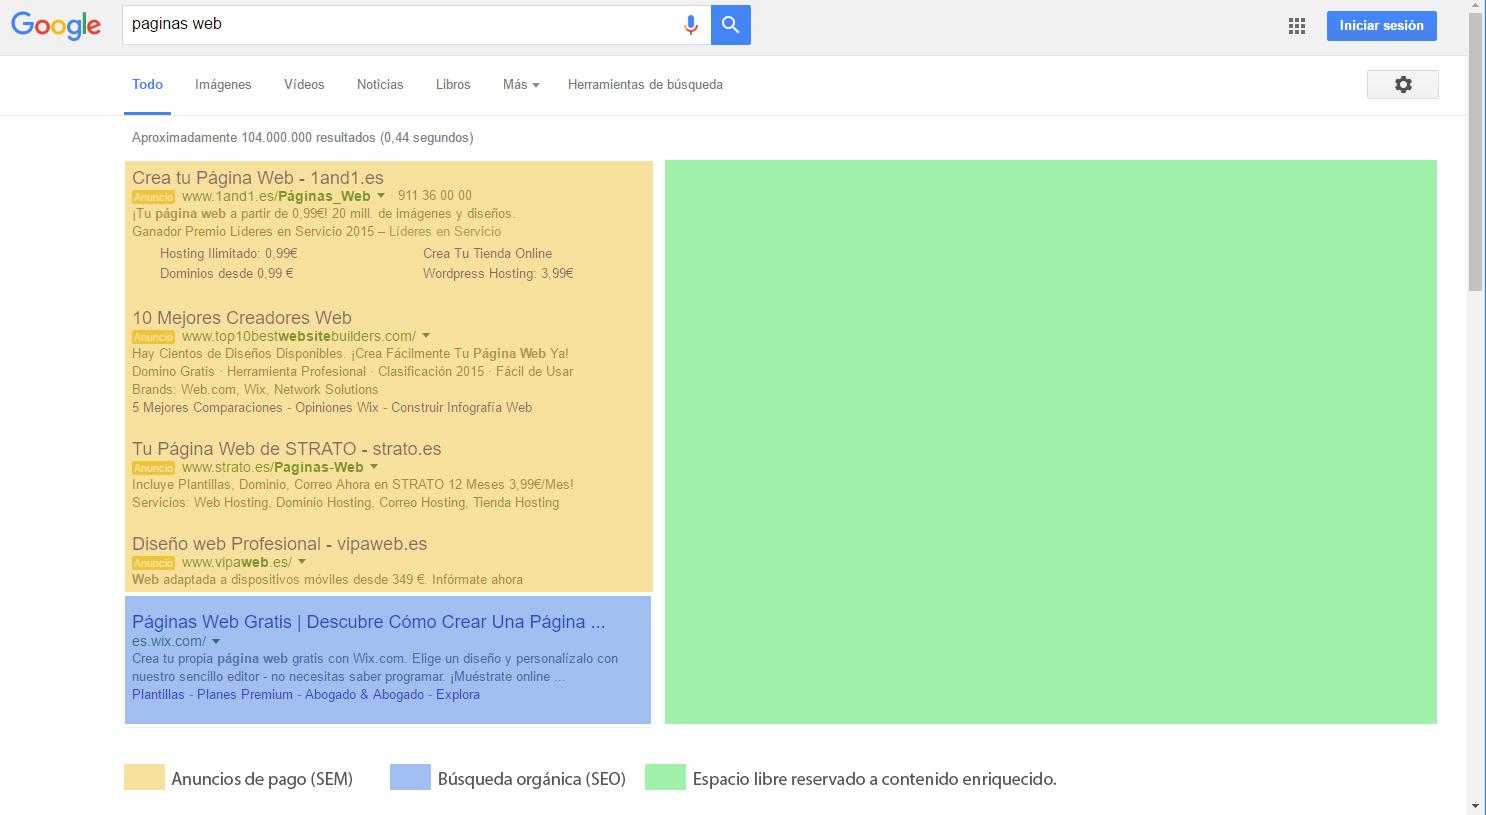 contenido enriquecido de google